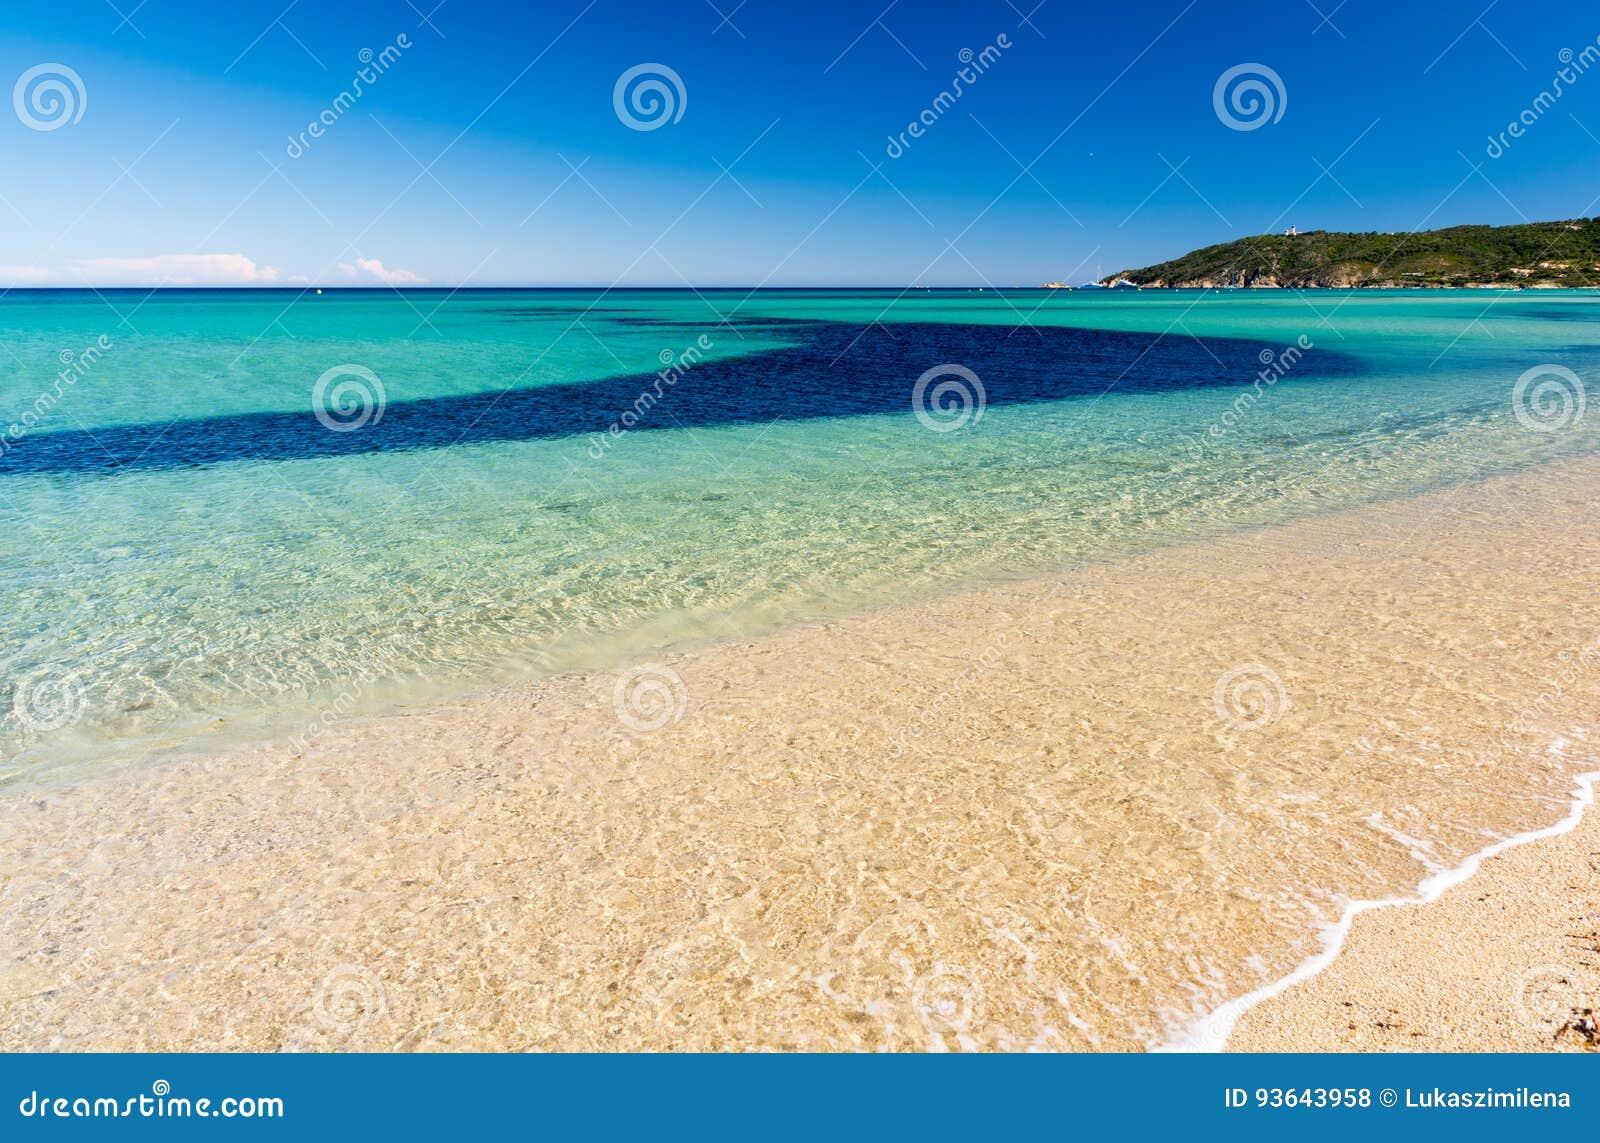 Crystal Clear Water On Pampelonne Beach Near Saint Tropez In South